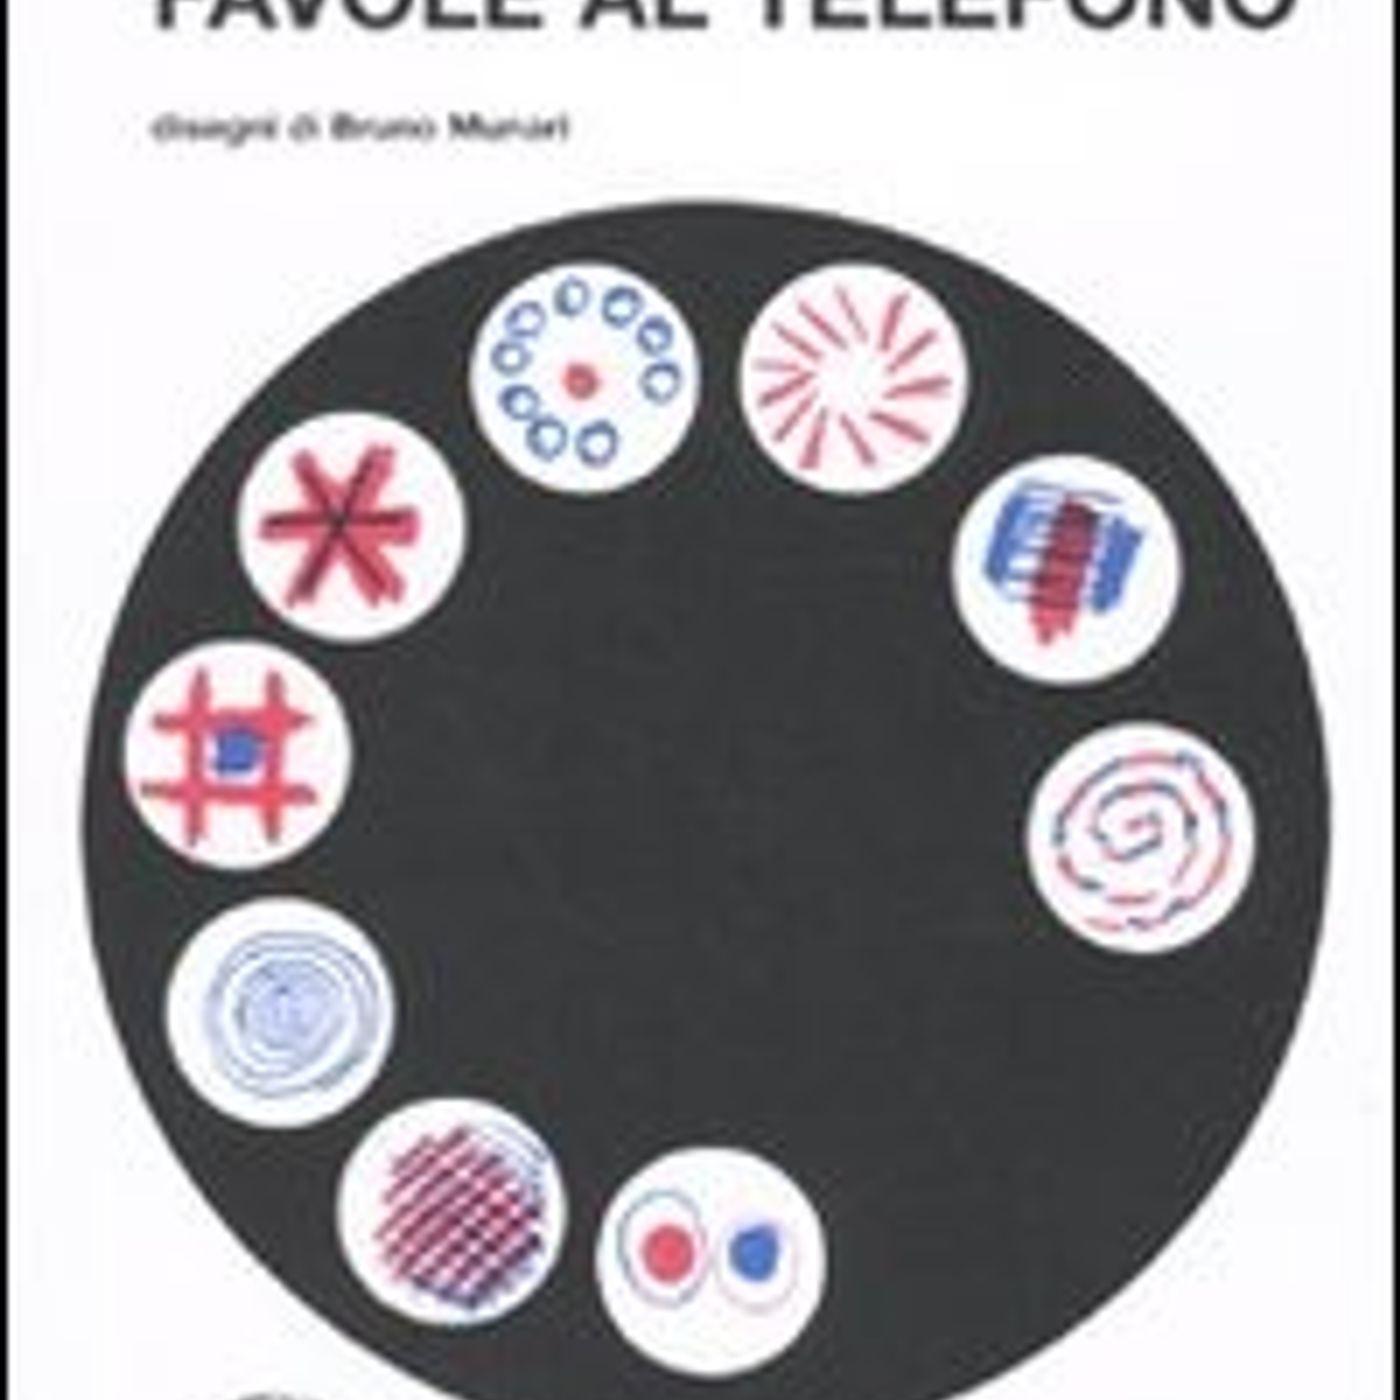 Radio Giochiecolori -  Il paese senza punta (Gianni Rodari)